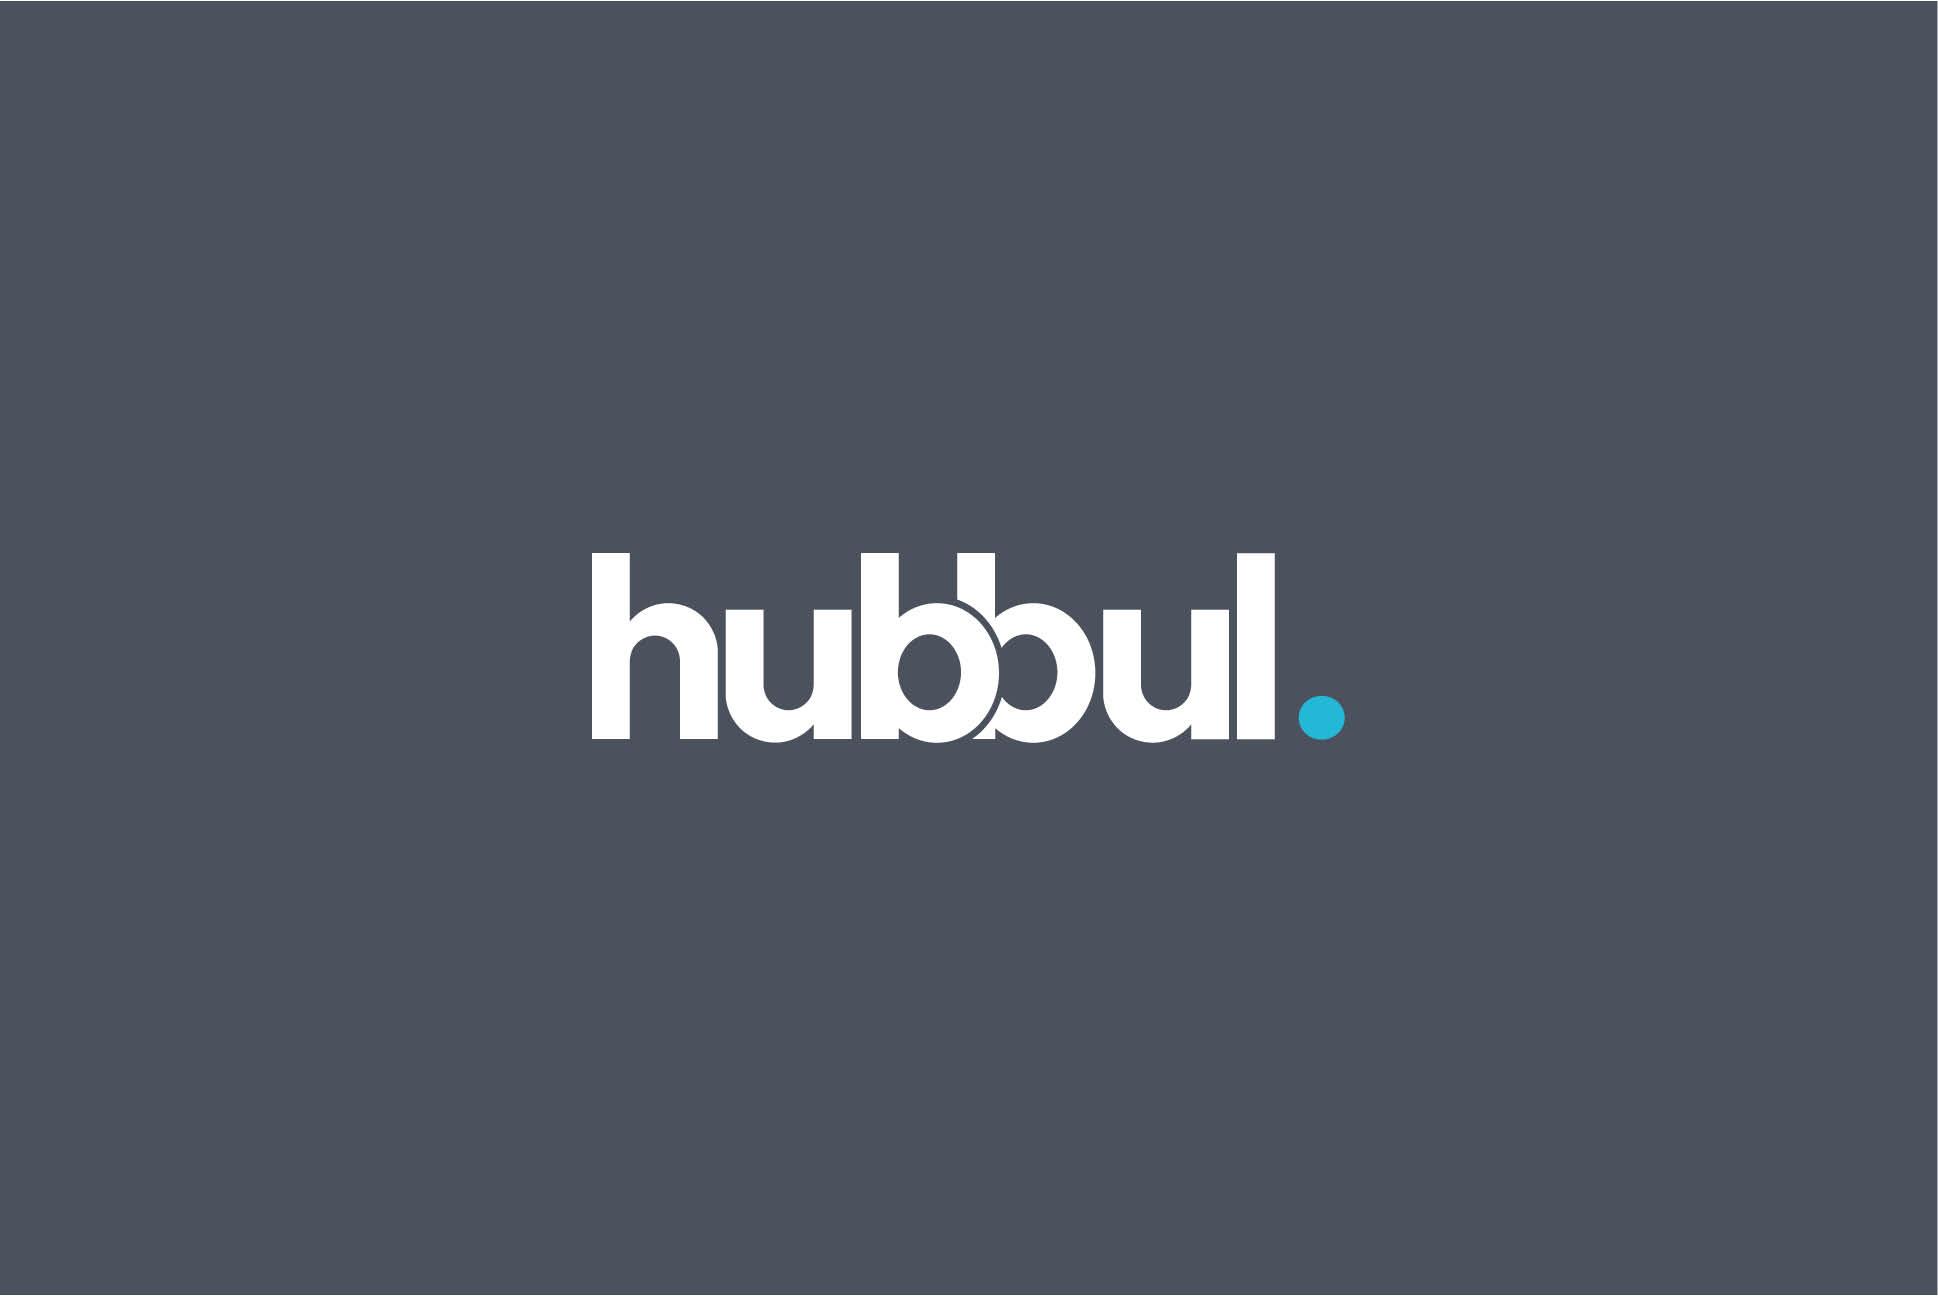 hubbul logo   Branding, Strategy and Logo Design   Independent Marketing   IM London   London Branding Agency